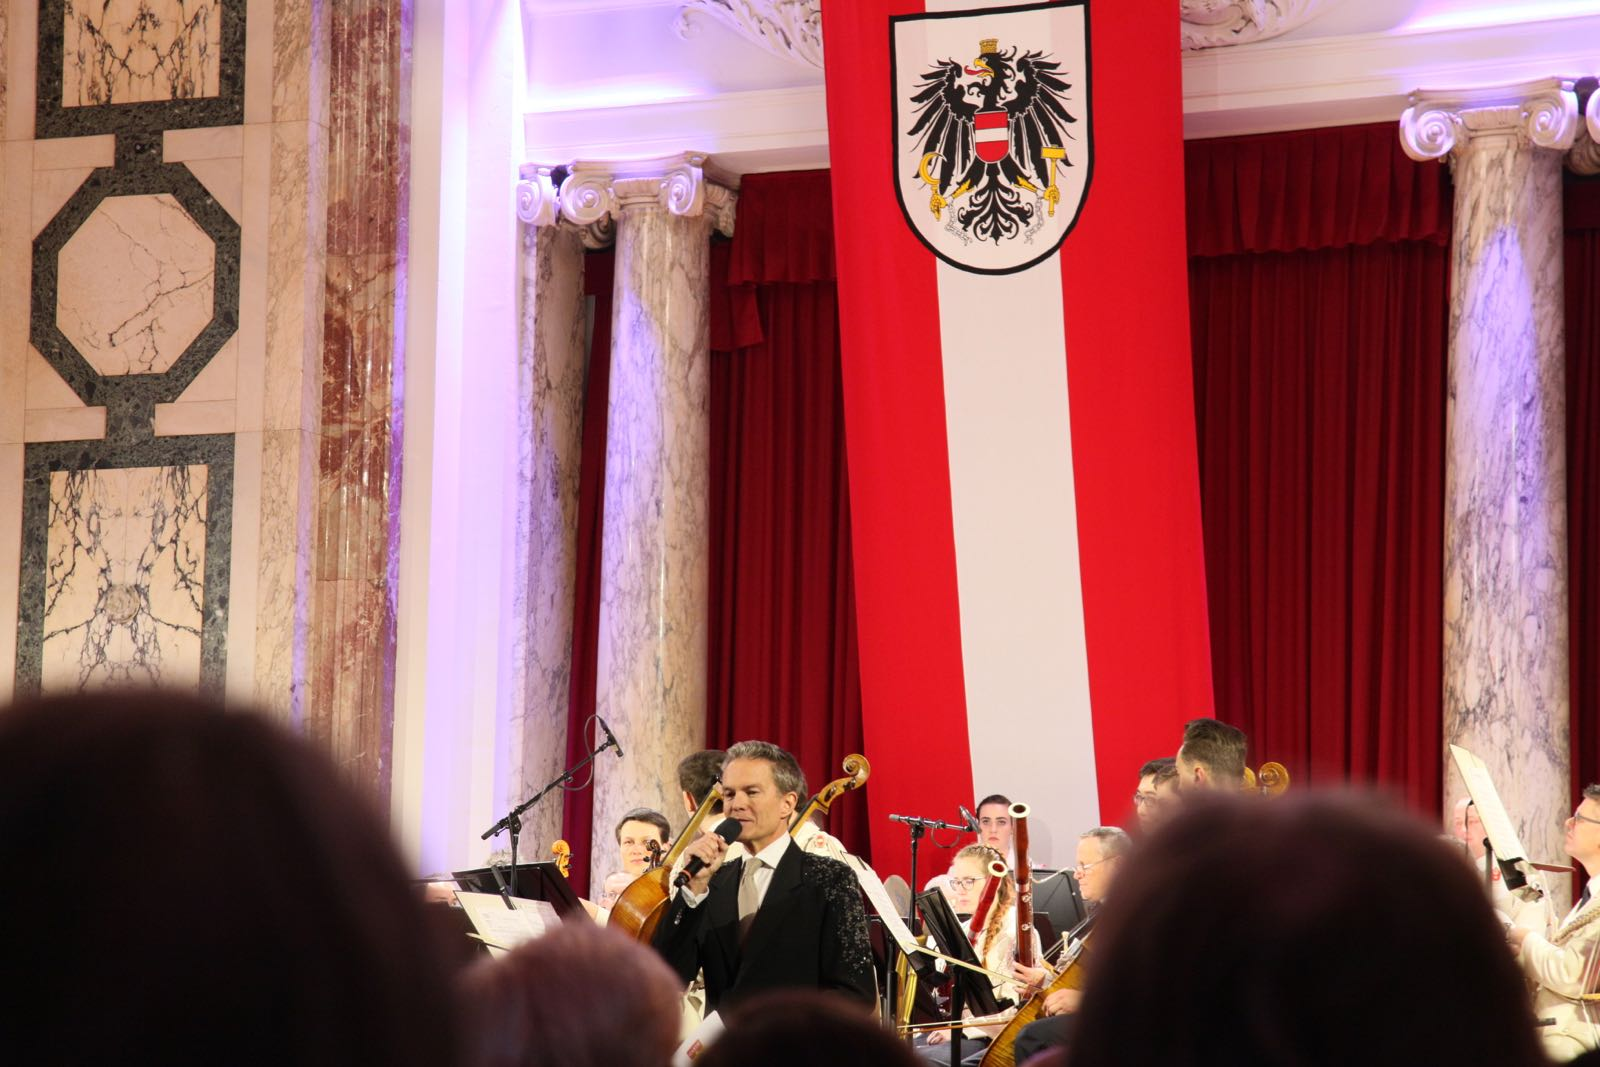 2019_03_14Gardemusik_Frühjahrskonzert_HBP_Hofburg - 45 of 177